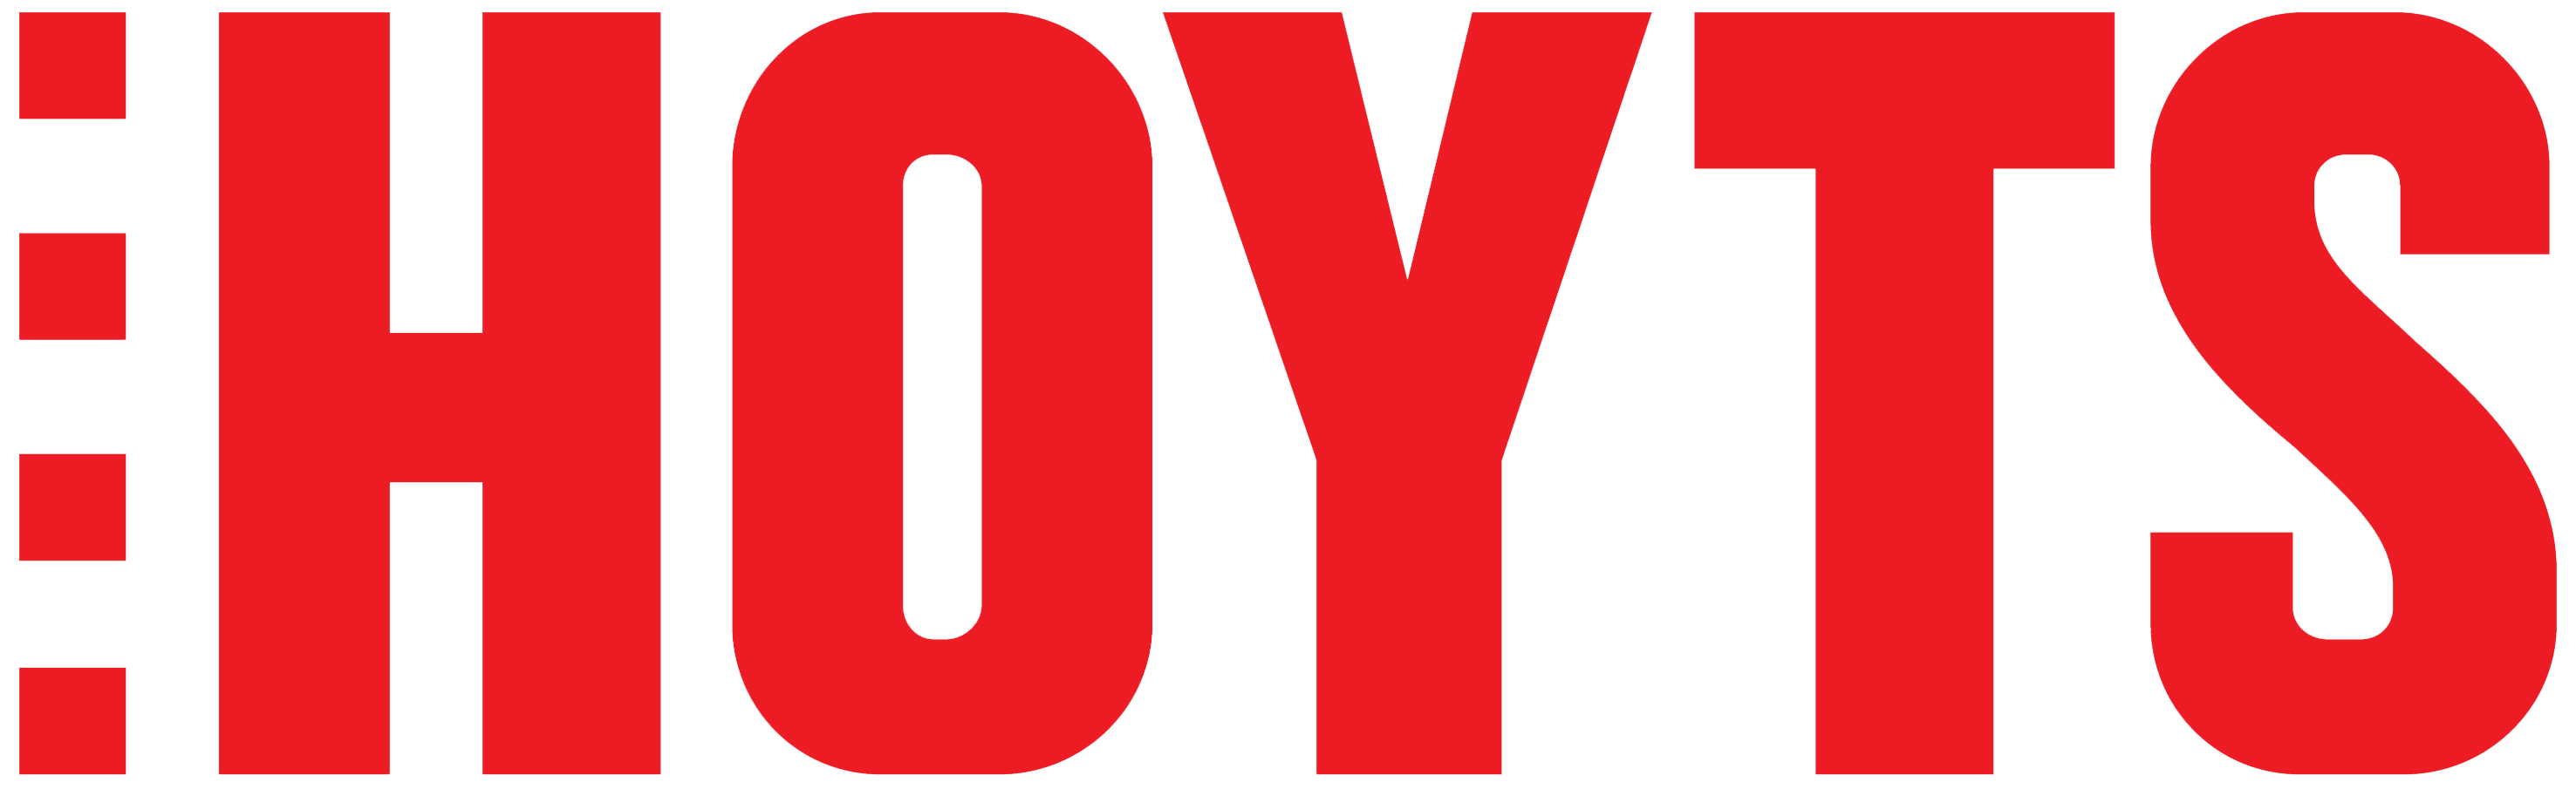 hoyts logo.